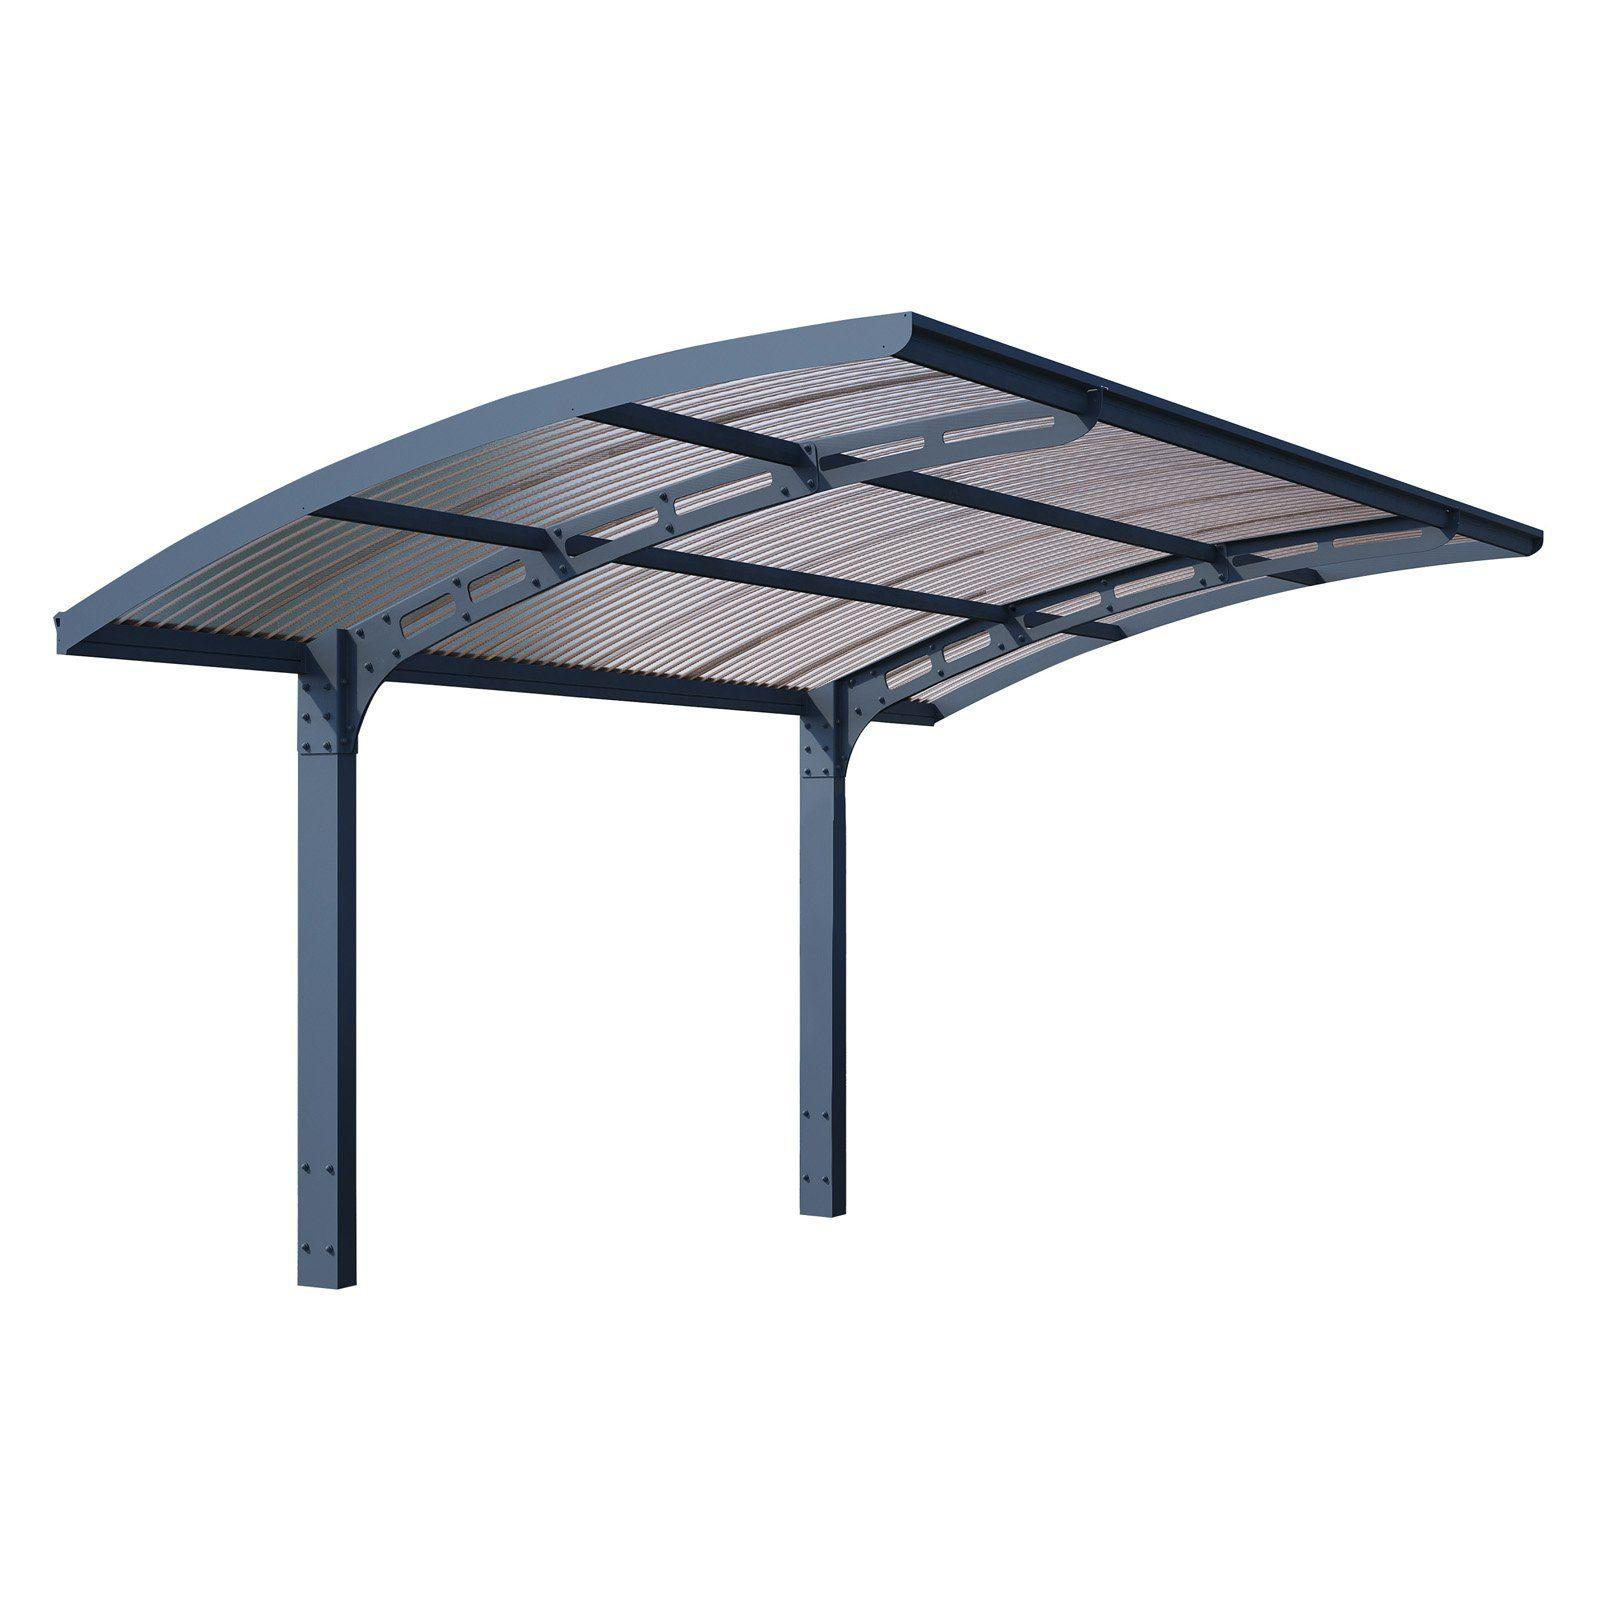 Palram Arizona Wave 5000 10 X 16 Ft Carport In 2020 Carport Polycarbonate Roof Panels Polycarbonate Panels